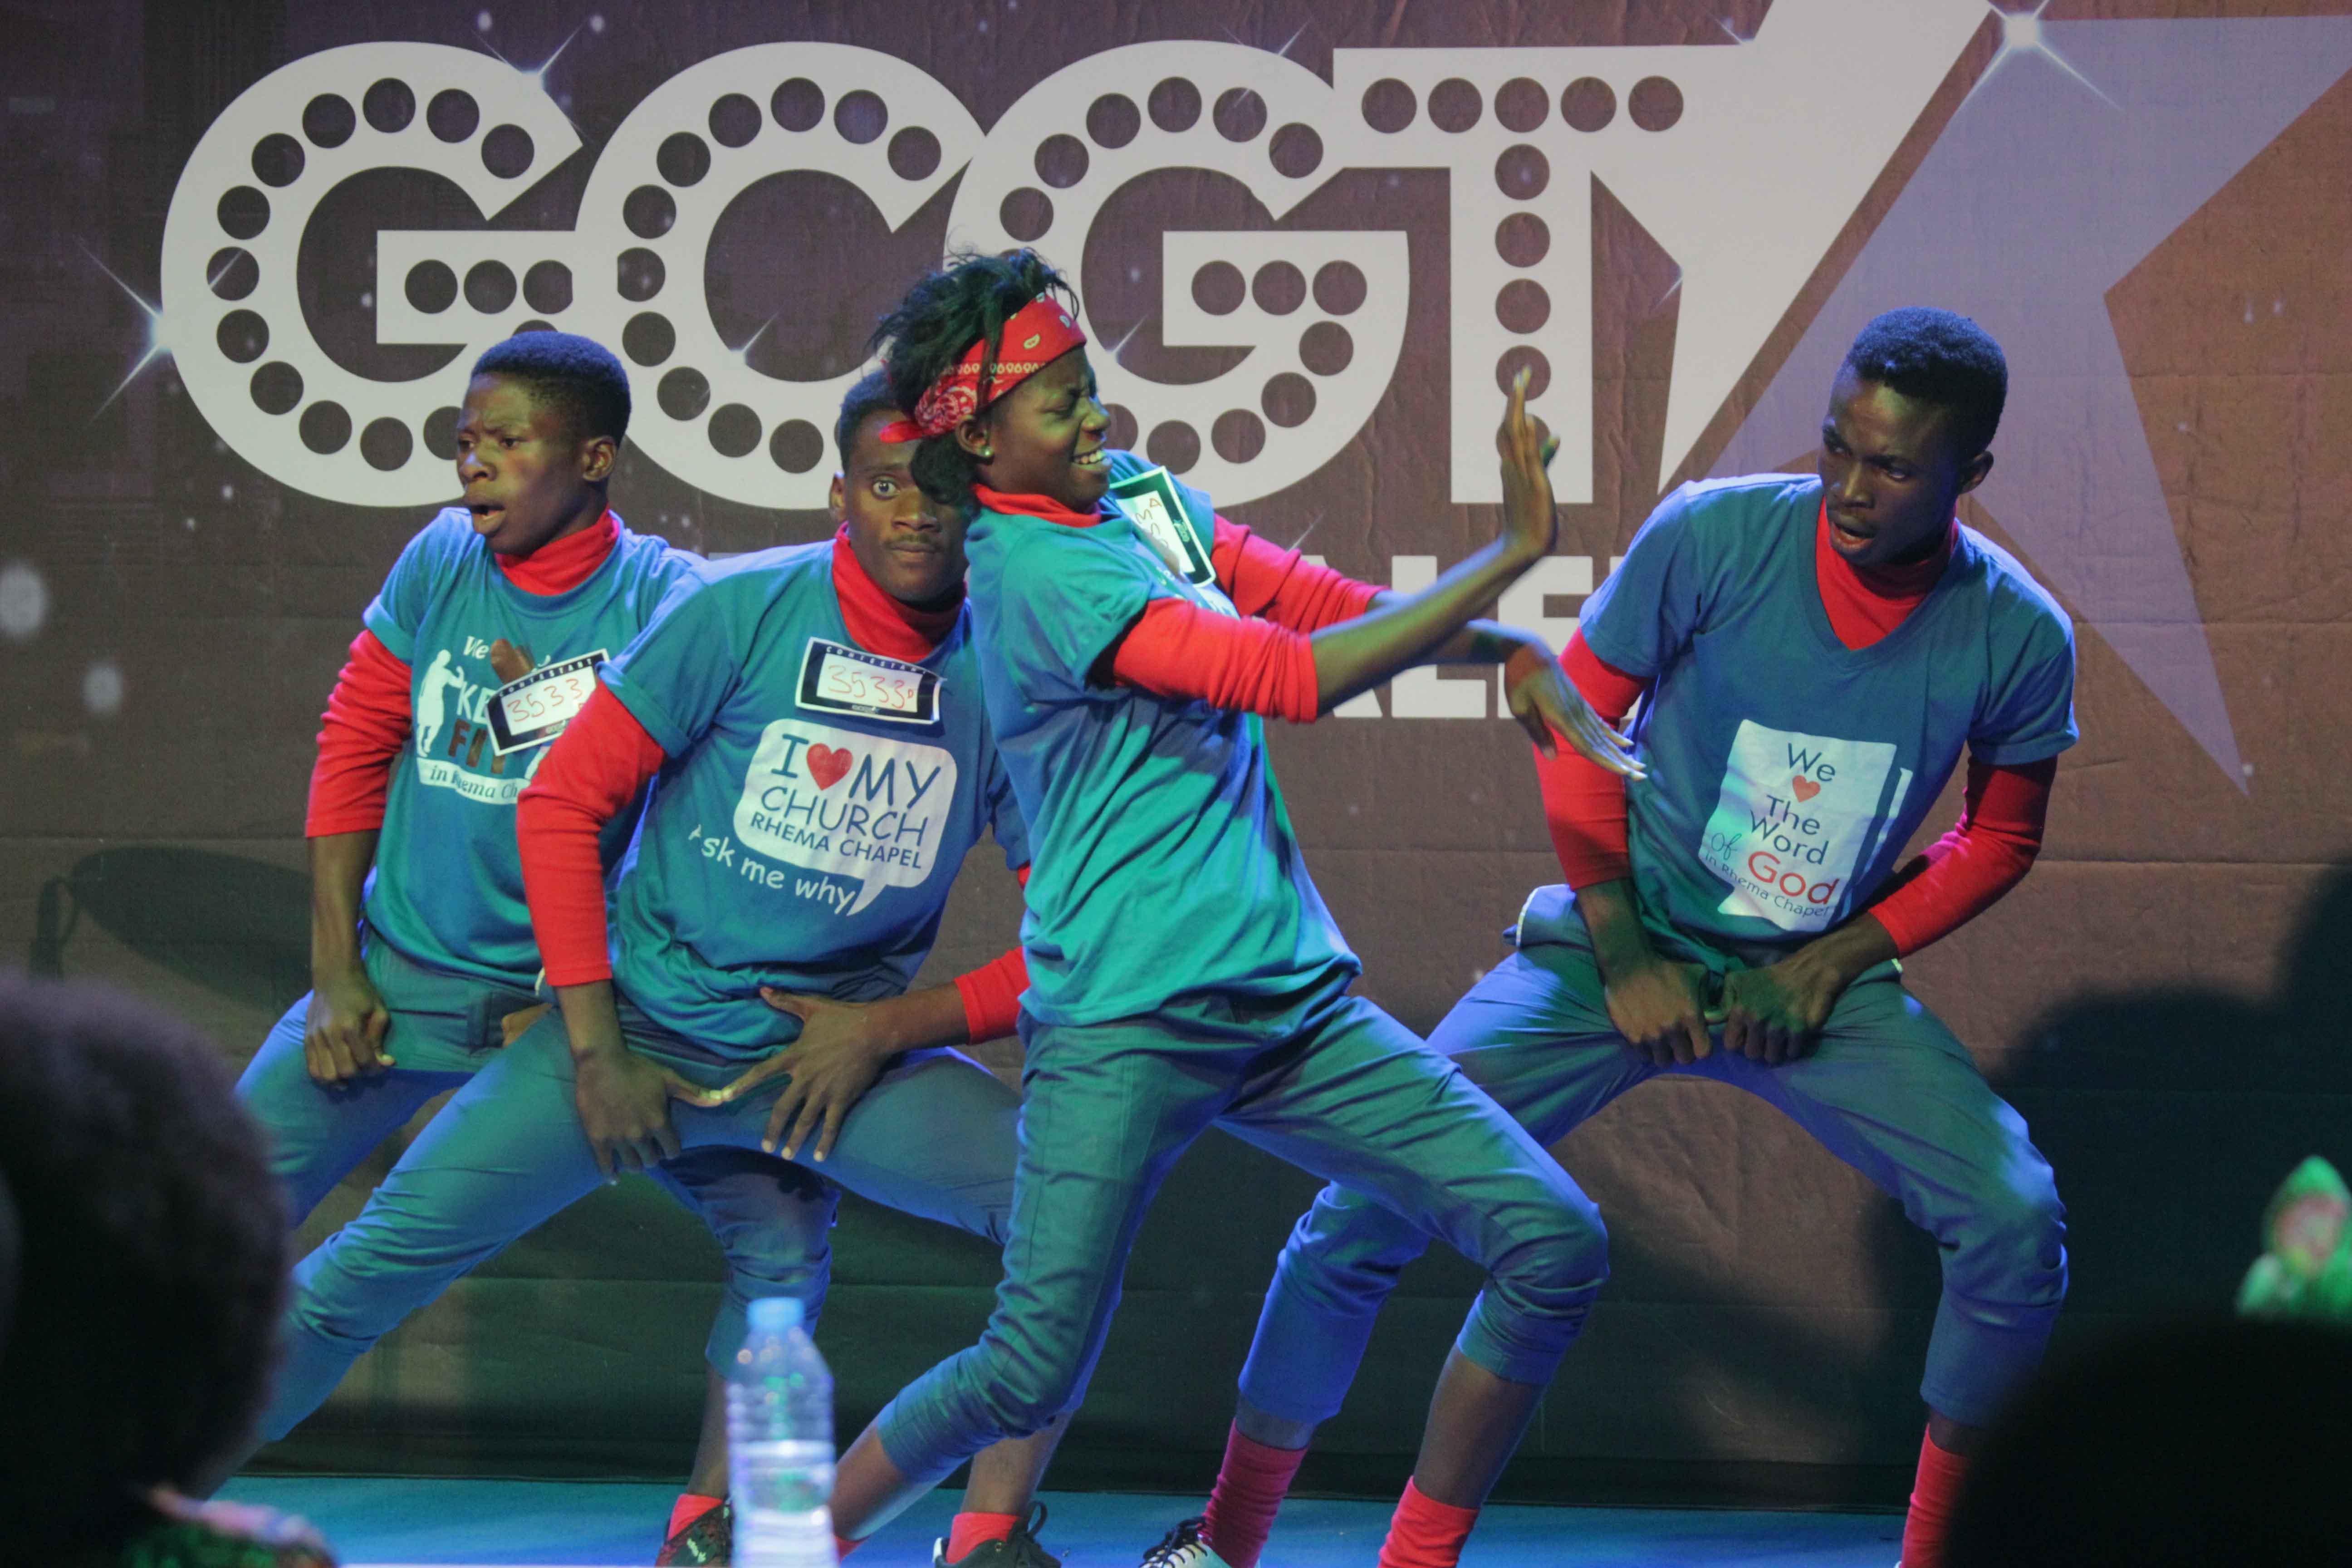 #Gcgt7 Lagos Regional Finals Set To Air This Sunday